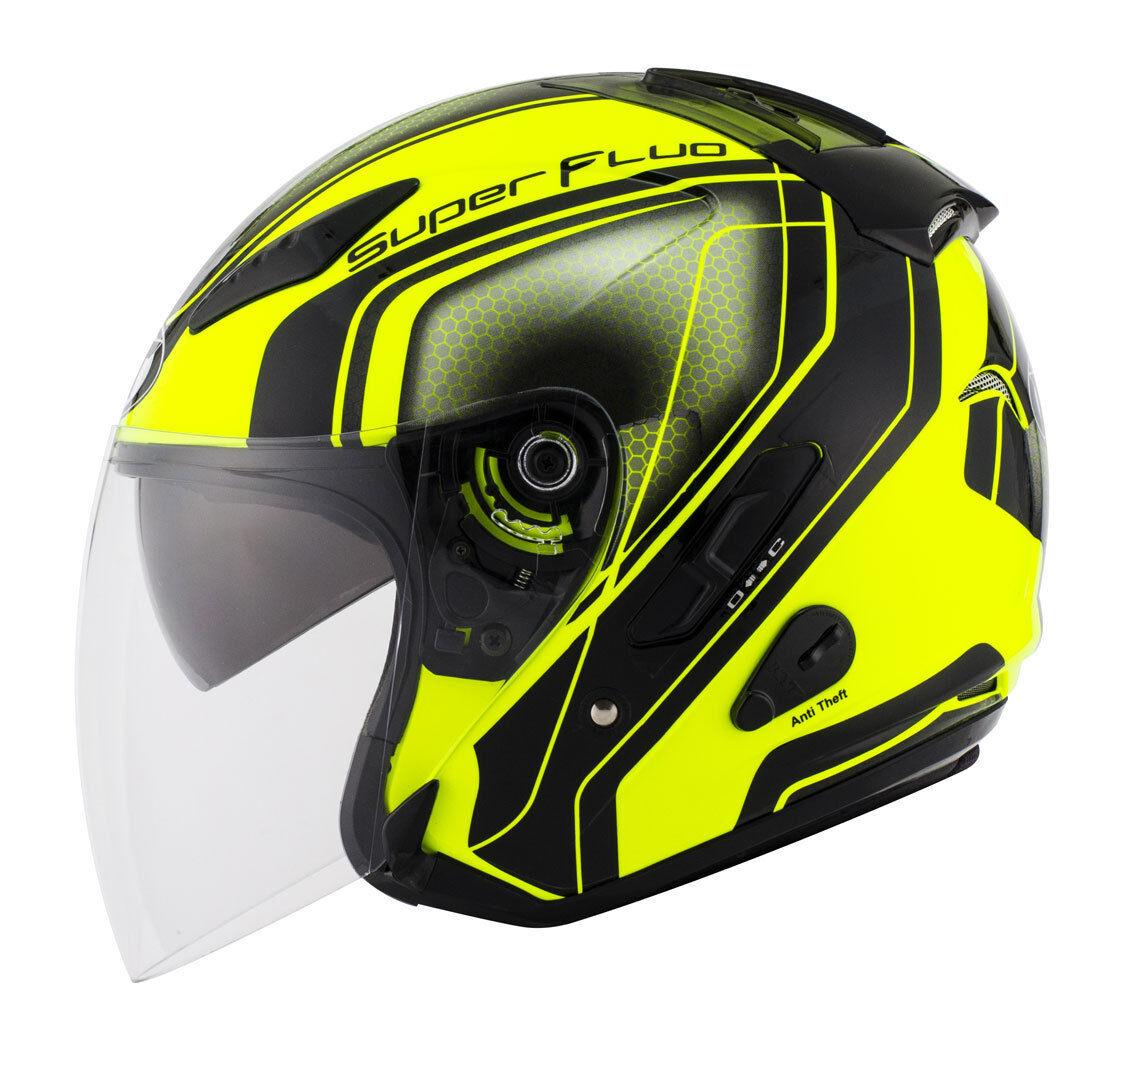 KYT Hellcat Superfluo Jet Helmet  - Size: Large